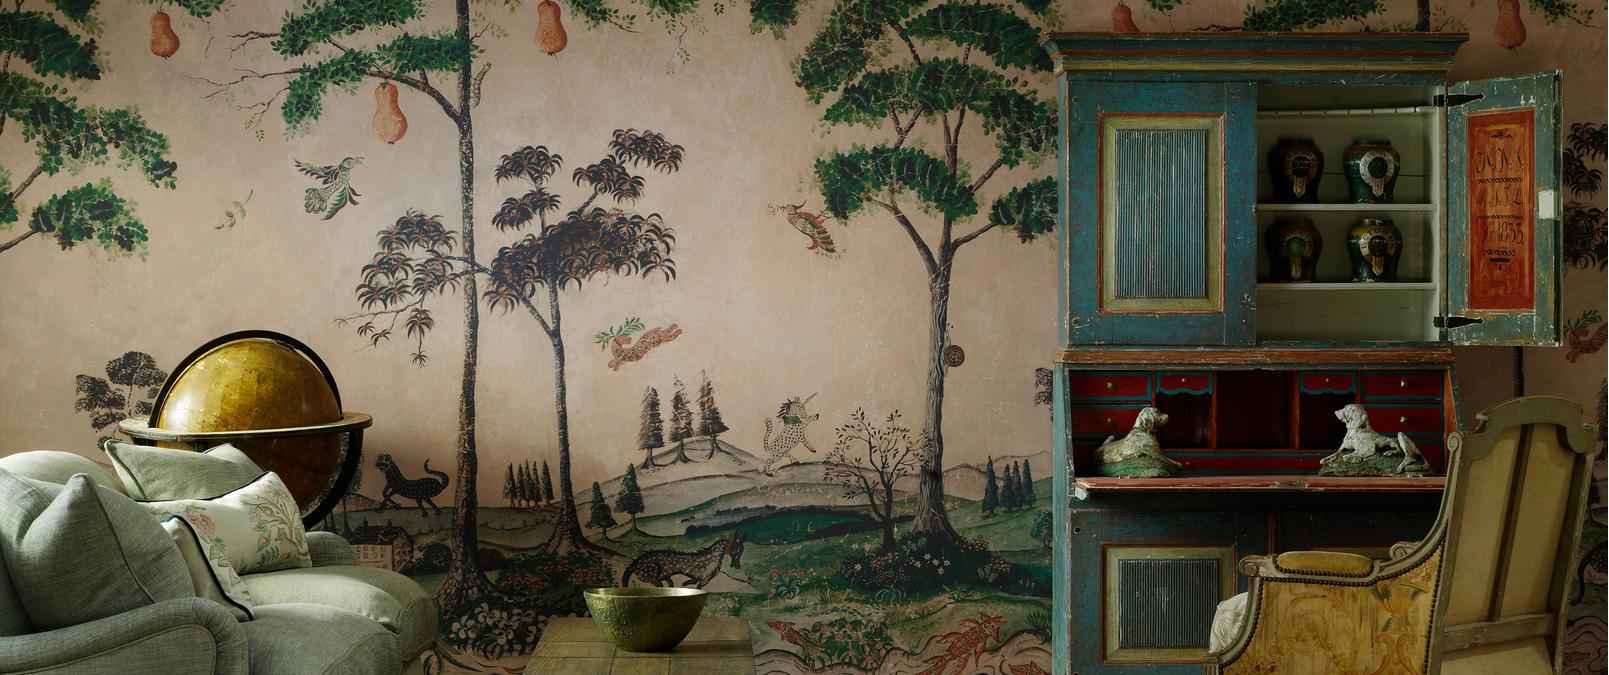 Mythical_Land_Large_Panel_Wallpaper_2